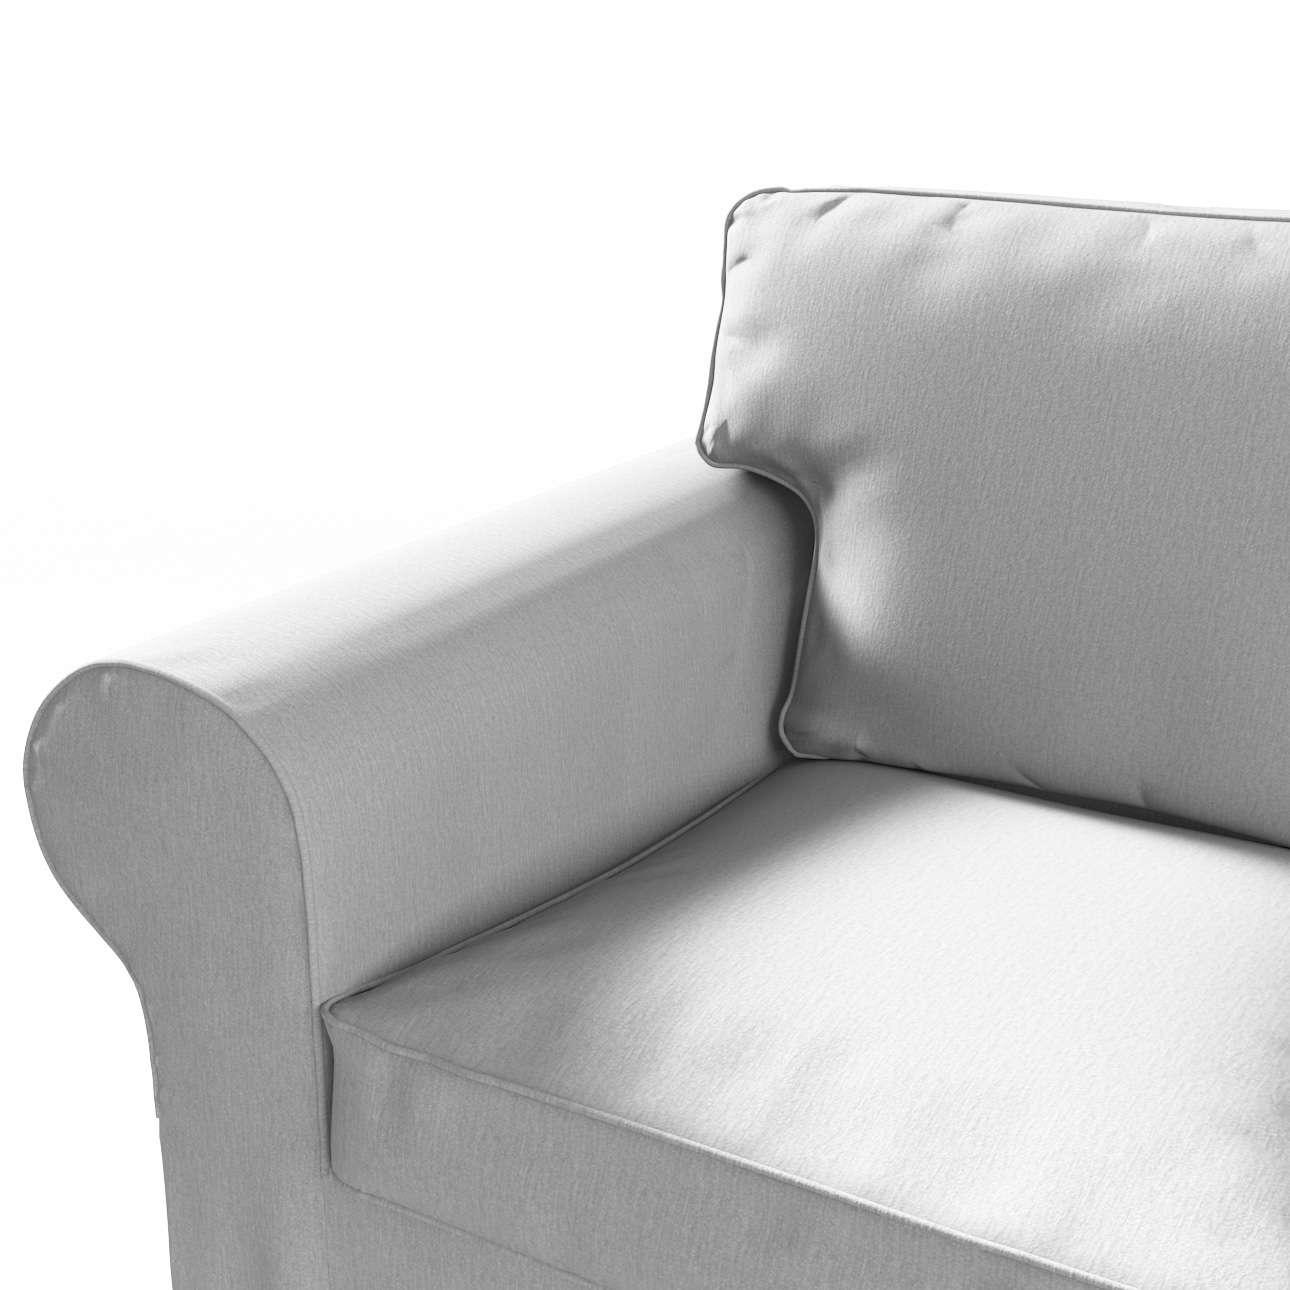 Ektorp 3-Sitzer Schlafsofabezug, ALTES Modell Sofahusse Ektorp 3-Sitzer Schlafsofa von der Kollektion Chenille , Stoff: 702-23